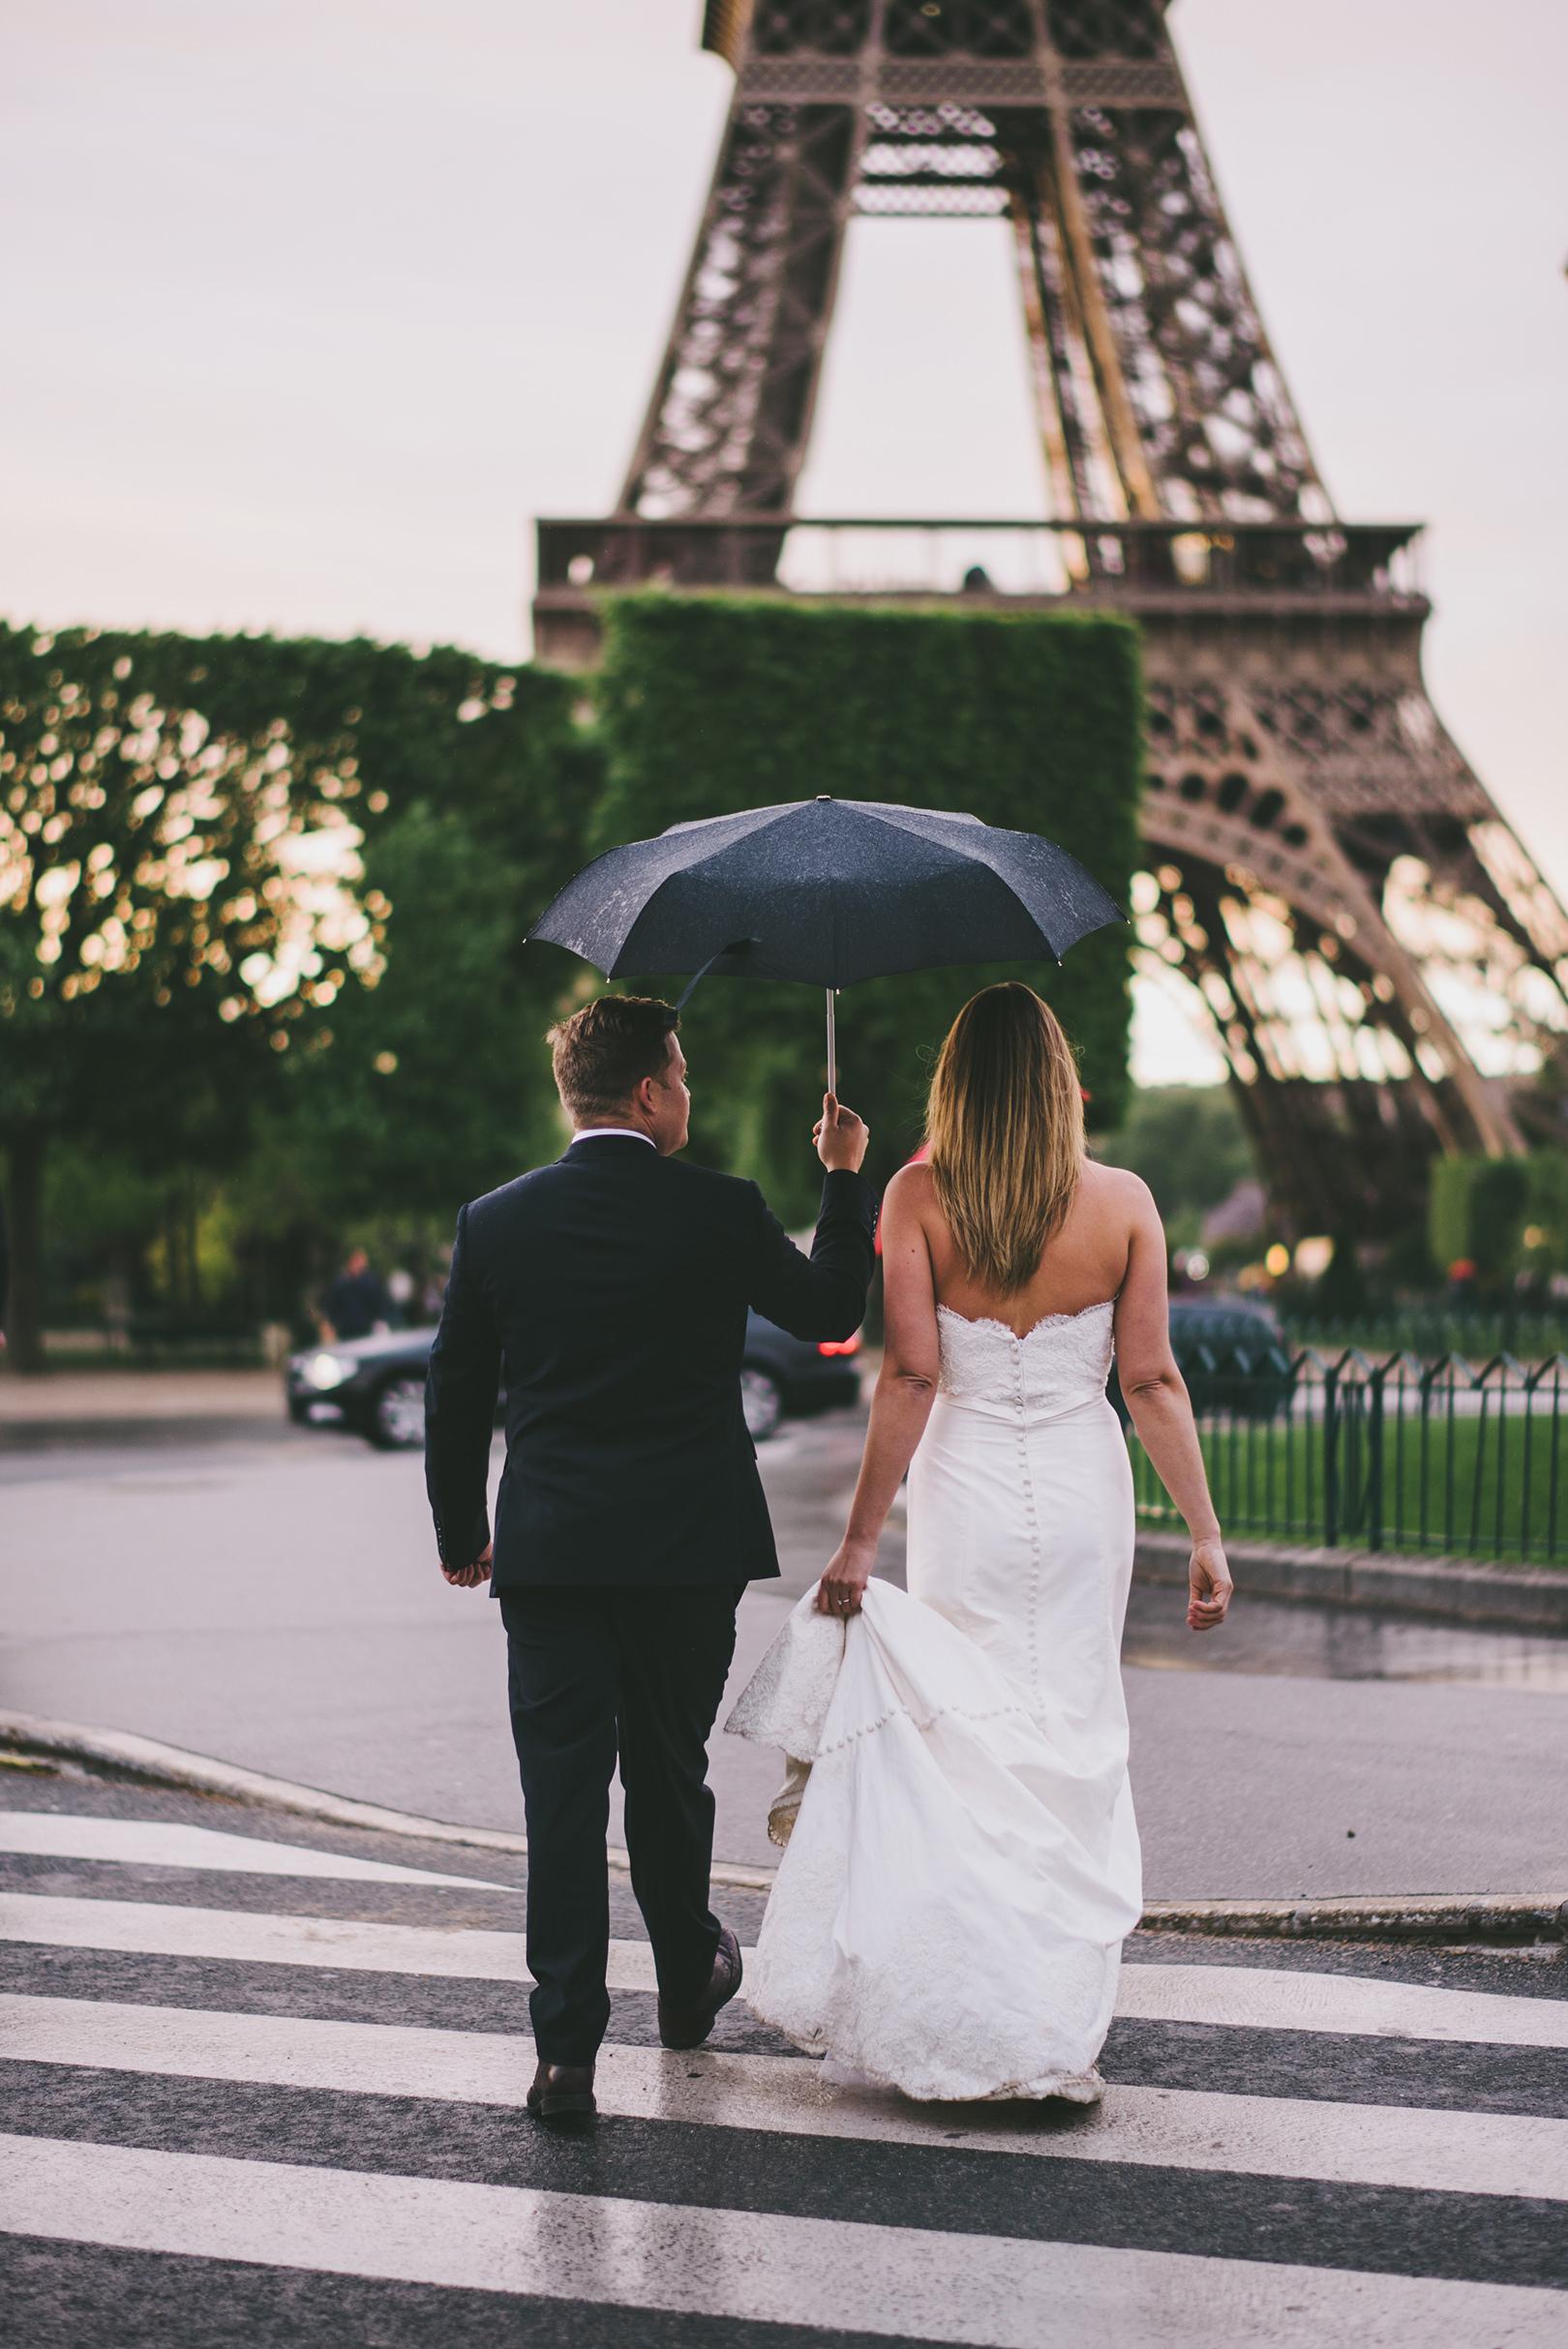 Justin & Trish - Paris - © Dallas Kolotylo Photography - 140